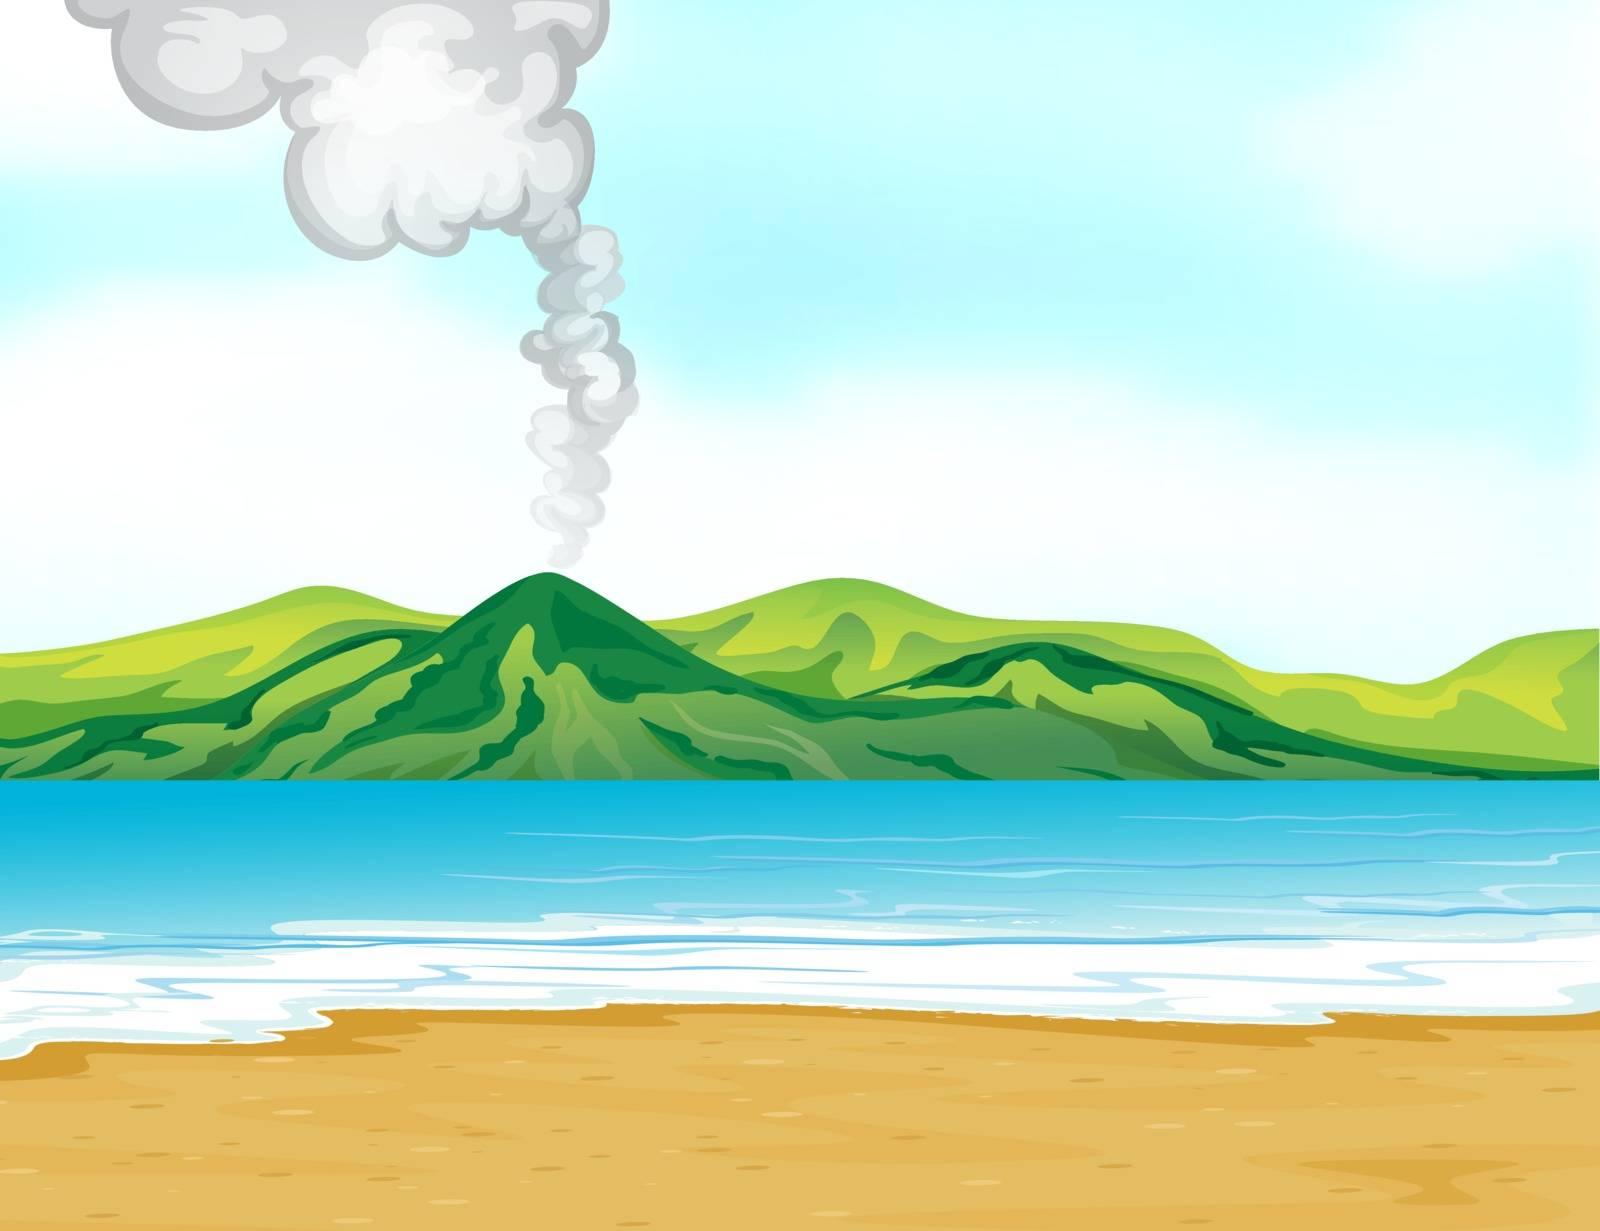 Illustration of the blue sea